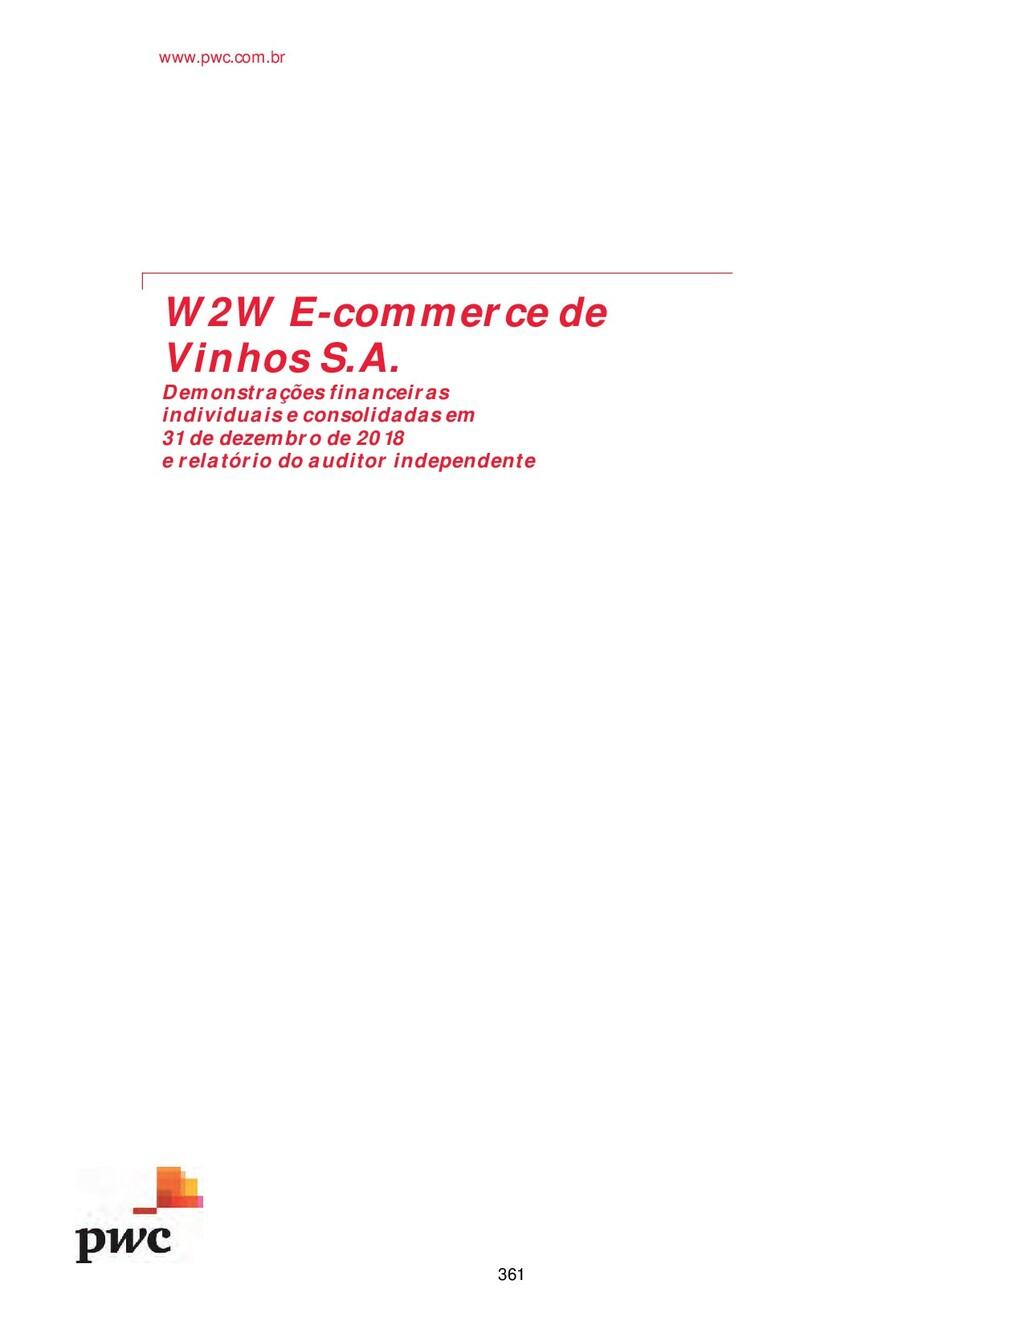 www.pwc.com.br W2W E-commerce de Vinhos S.A. De...